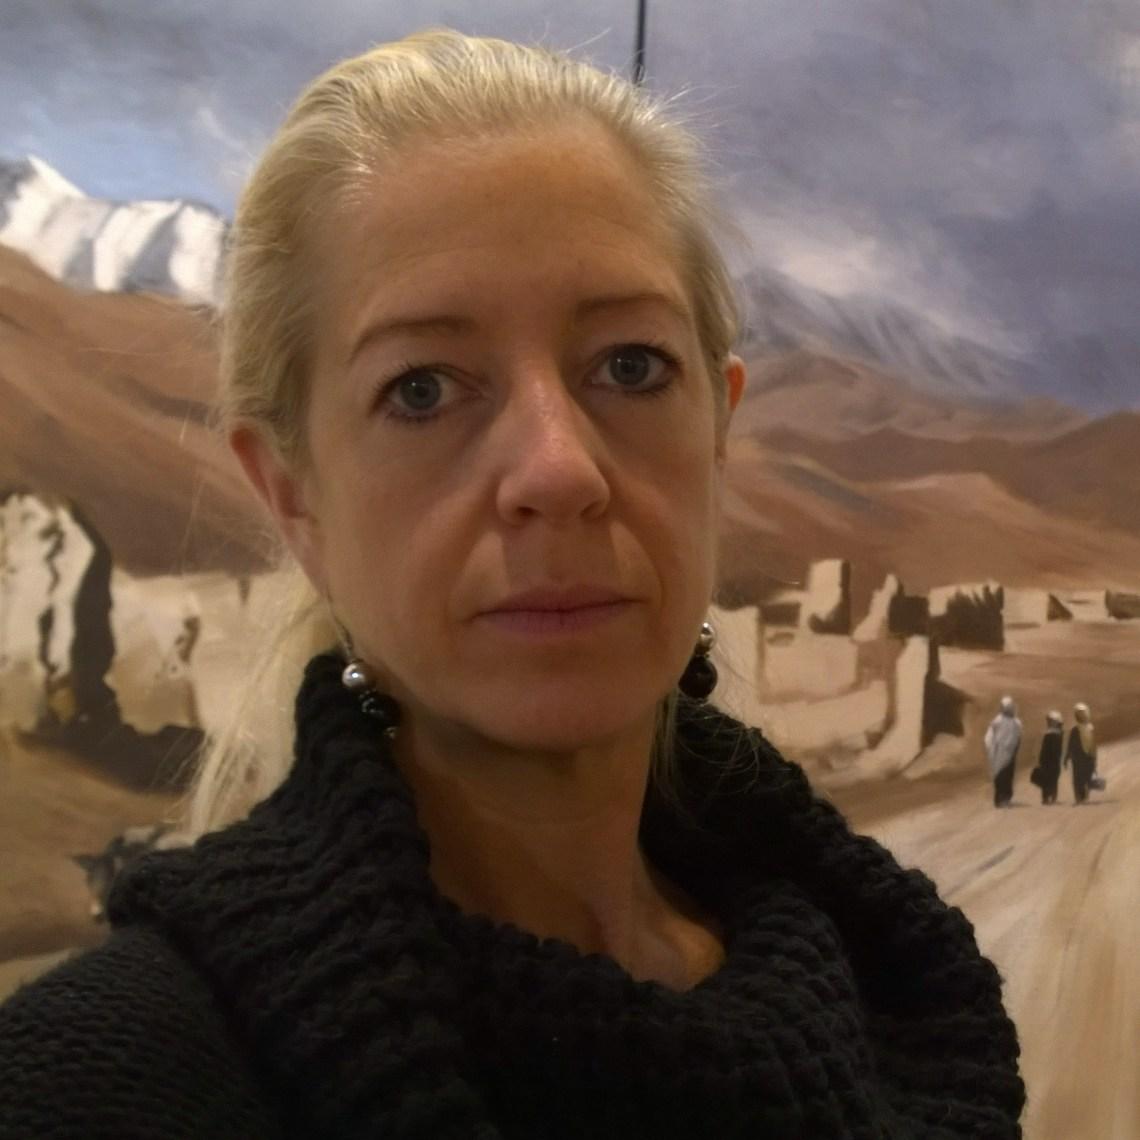 War artist Arabella Dorman